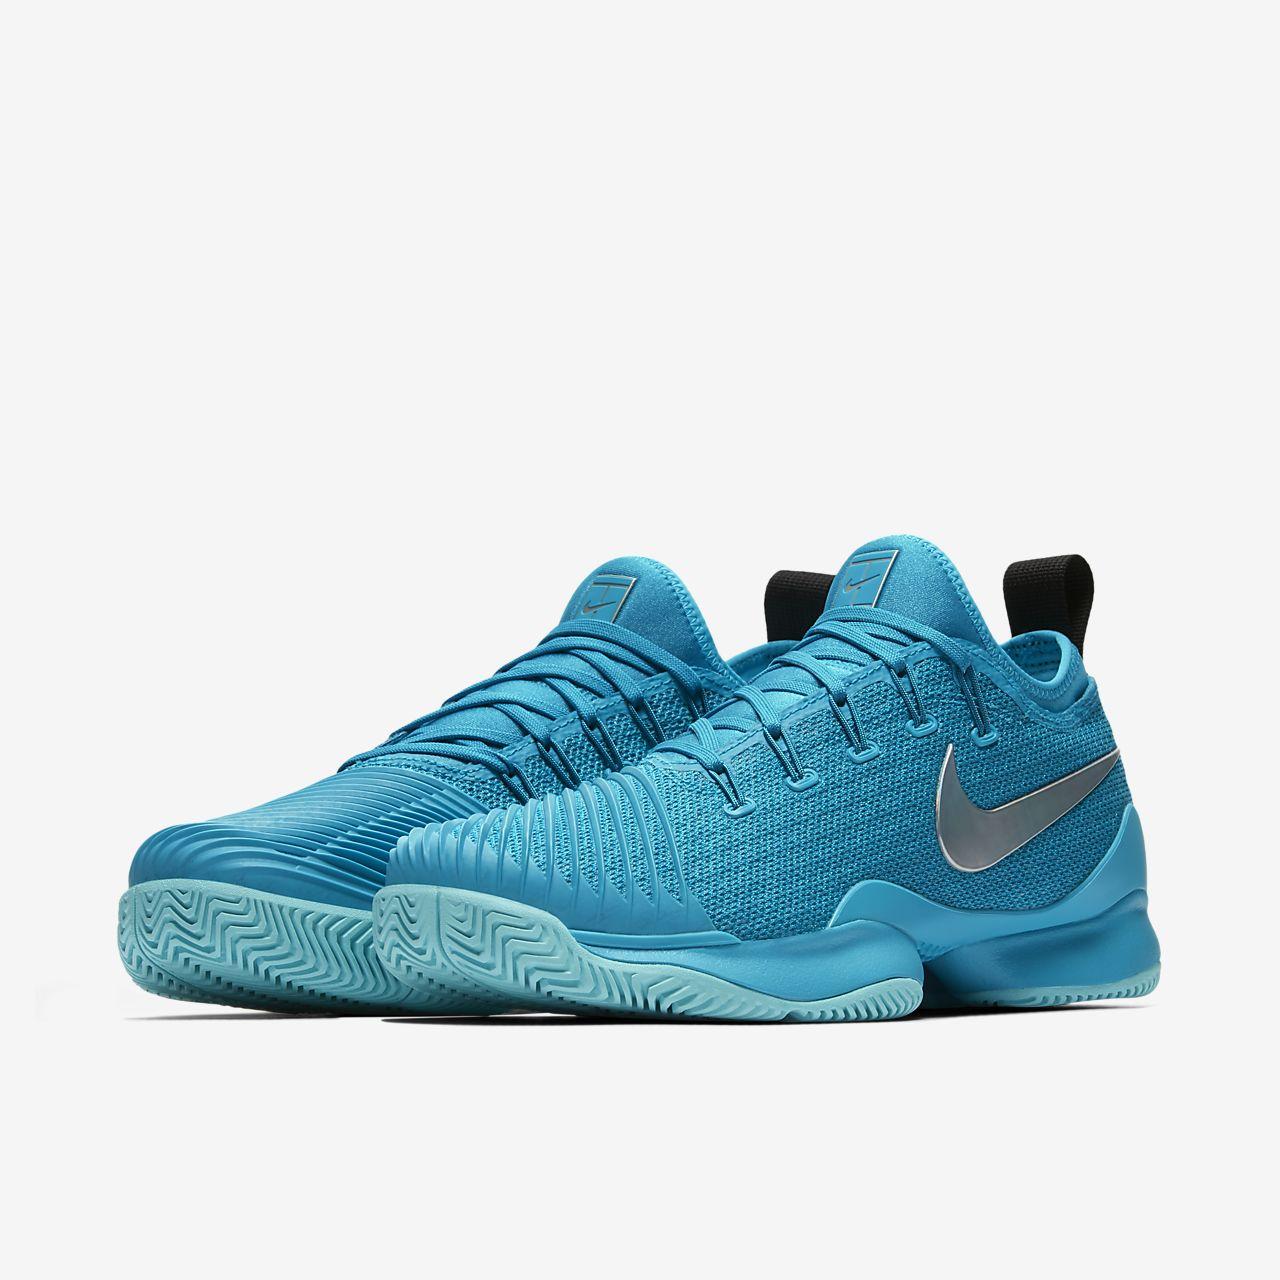 NikeCourt Air Zoom Ultra React HC Damen-Tennisschuh - Blau L6aKICah